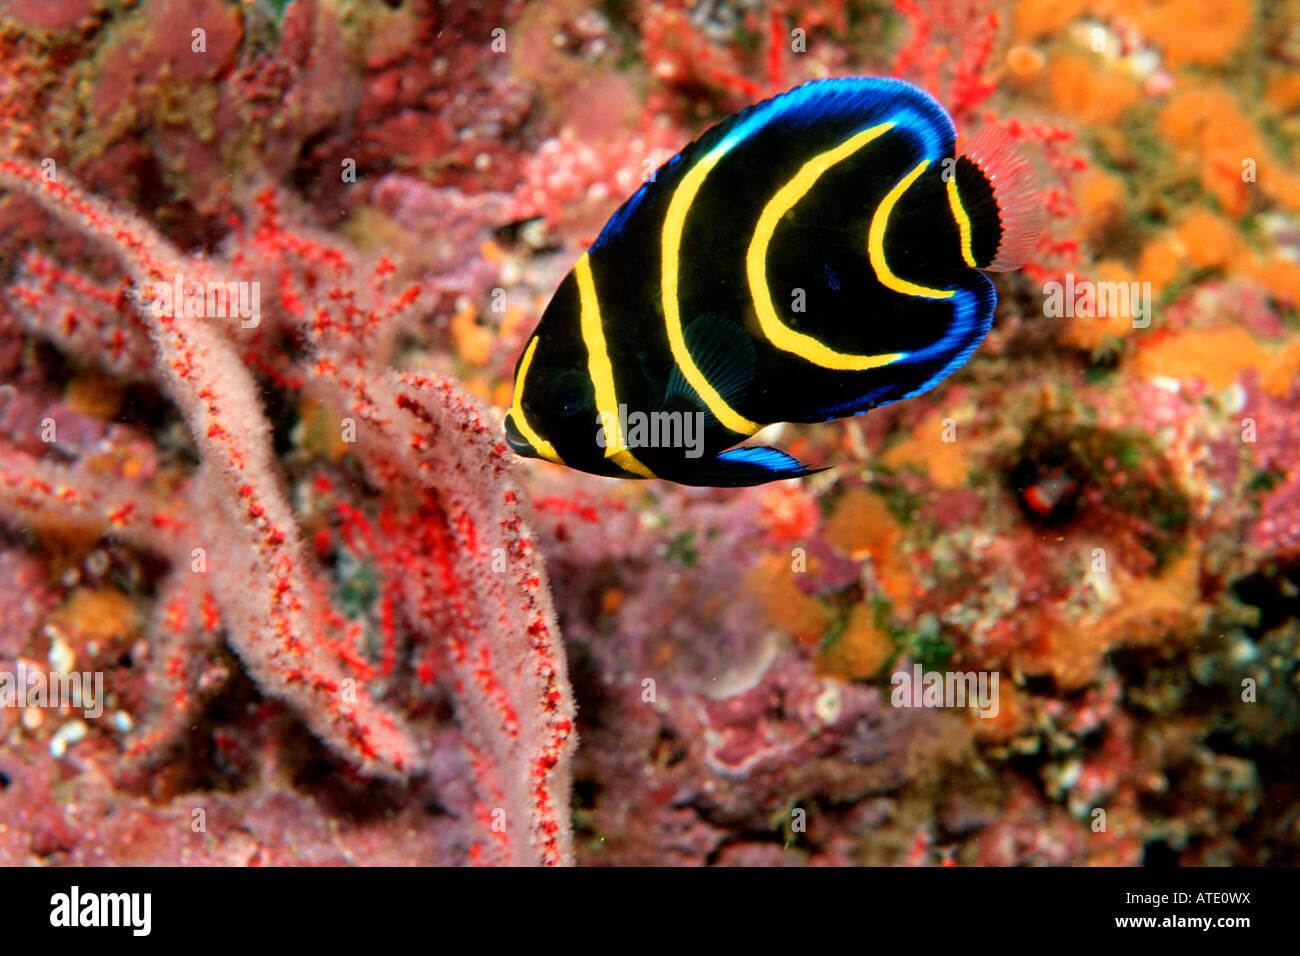 Cortez Angelfish Stock Photos & Cortez Angelfish Stock Images - Alamy